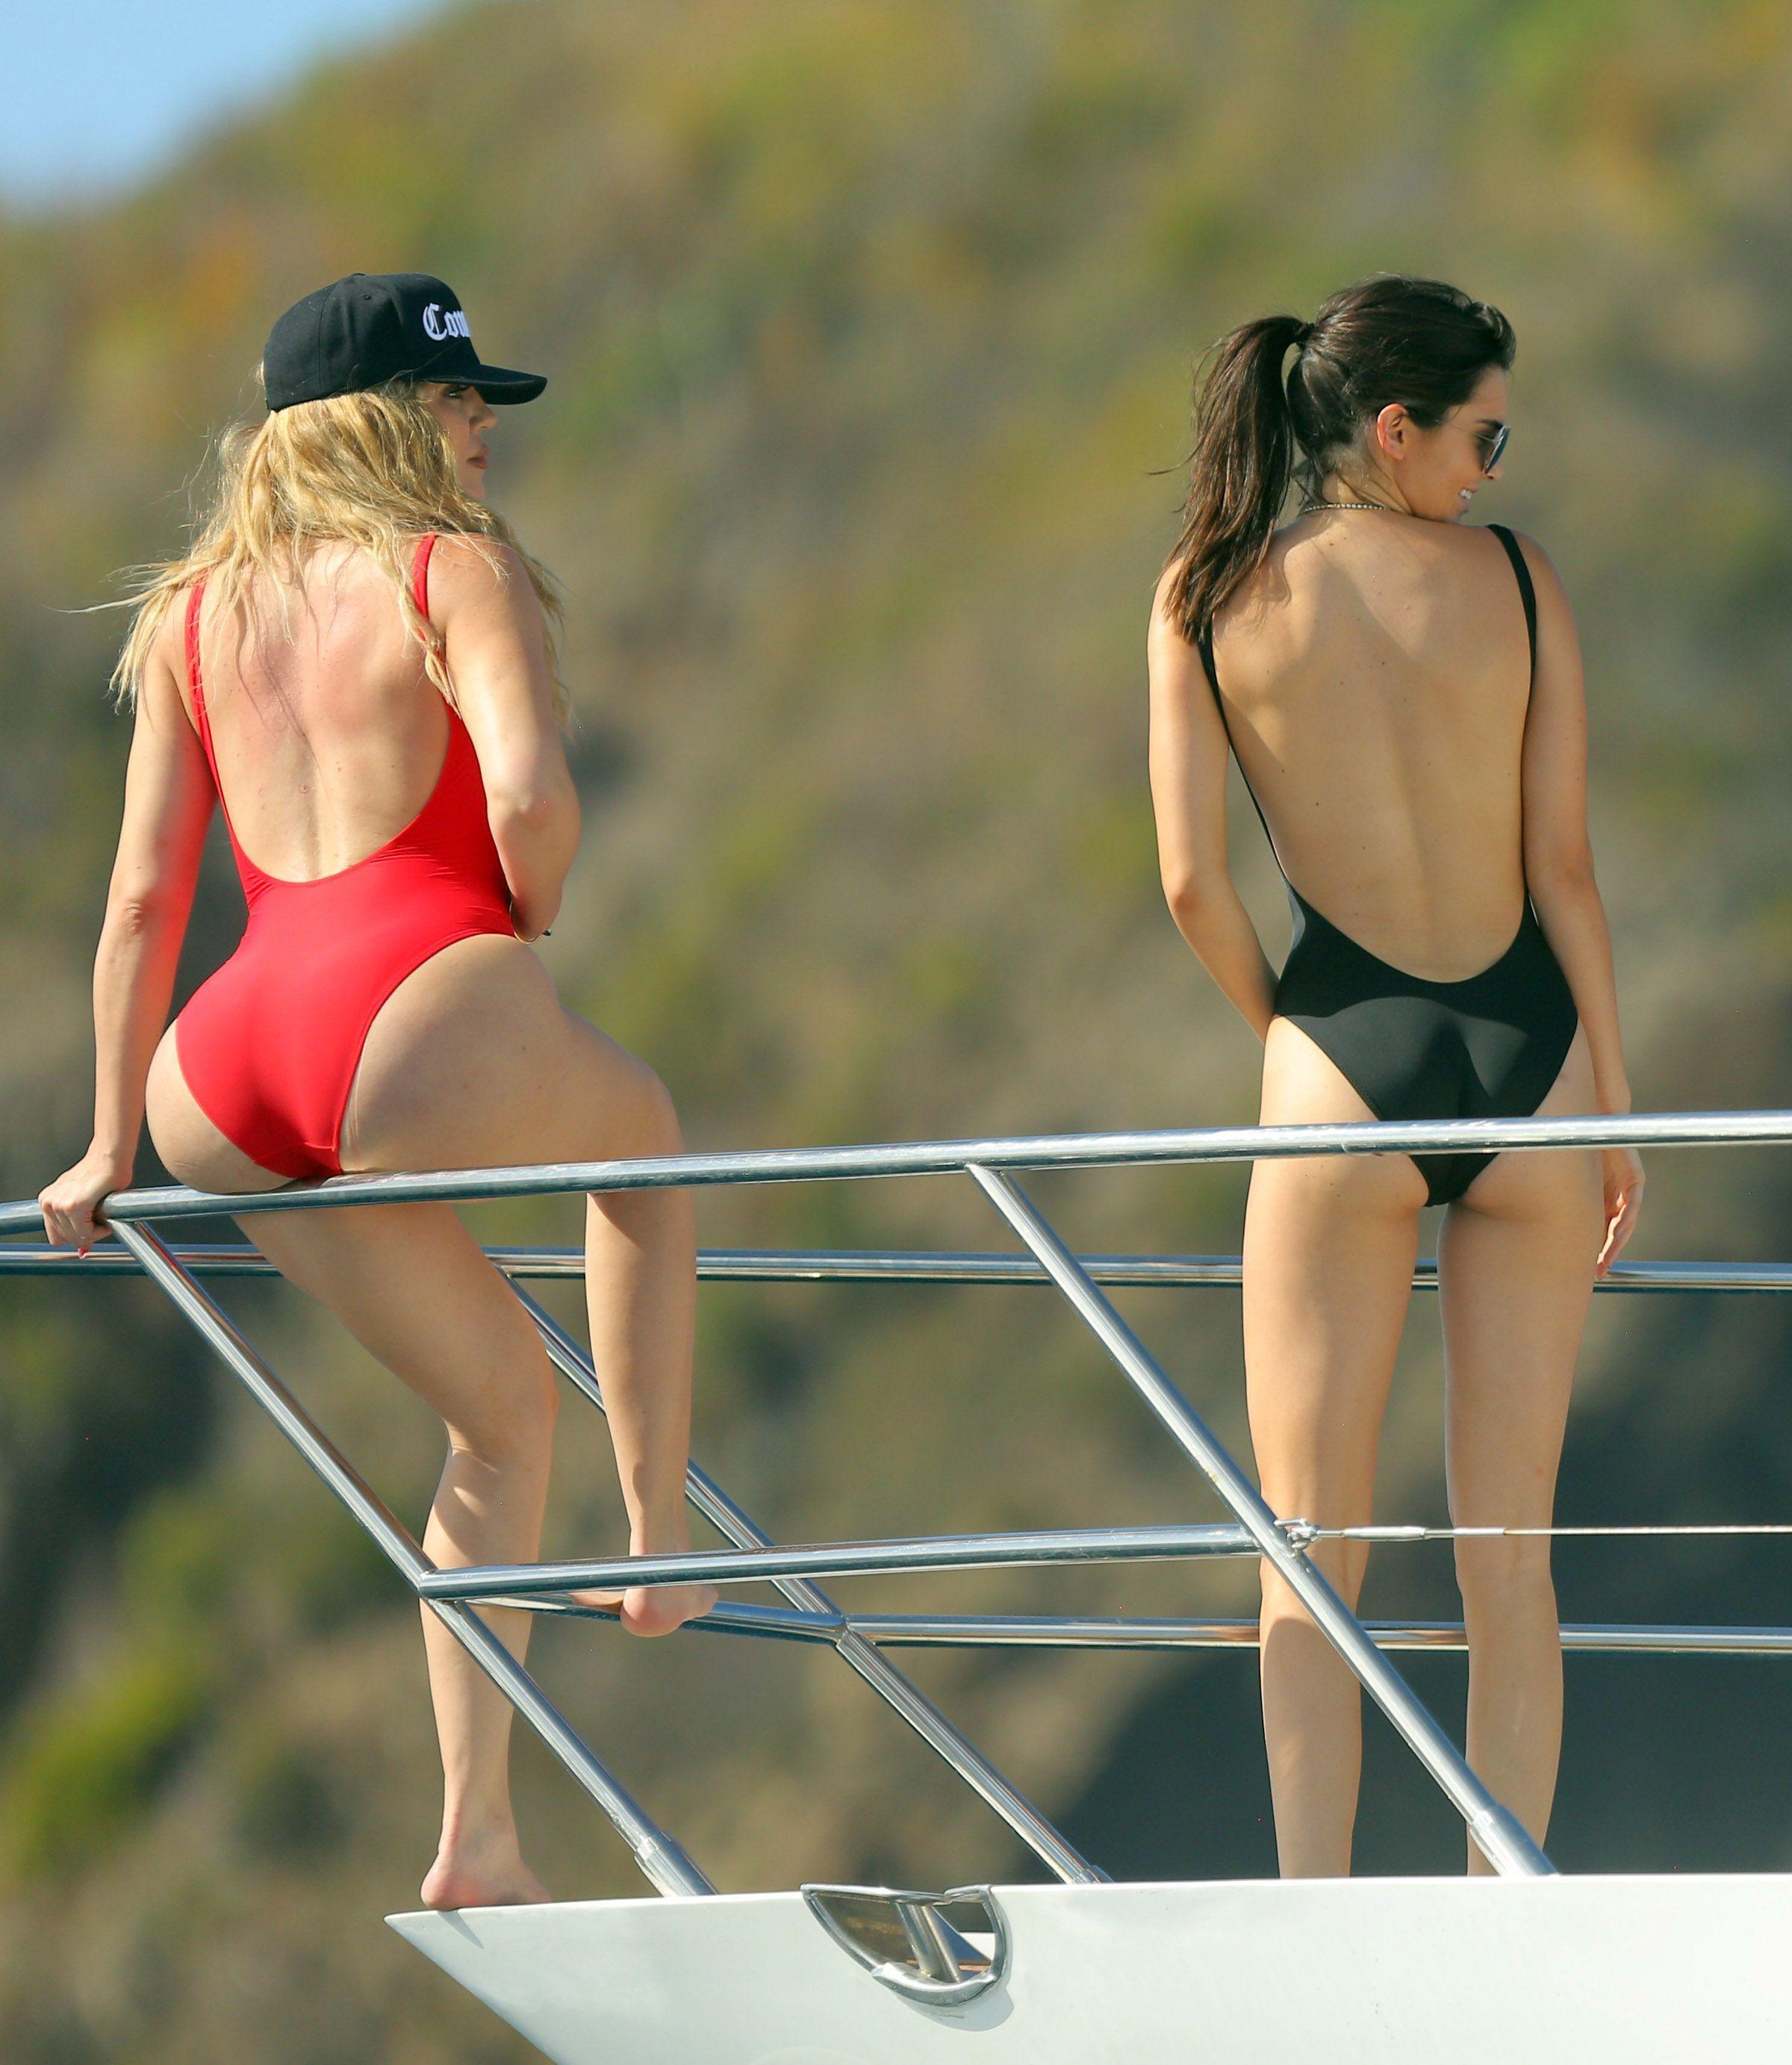 image Kendall jenner khloe amp kourtney kardashian must see Part 10